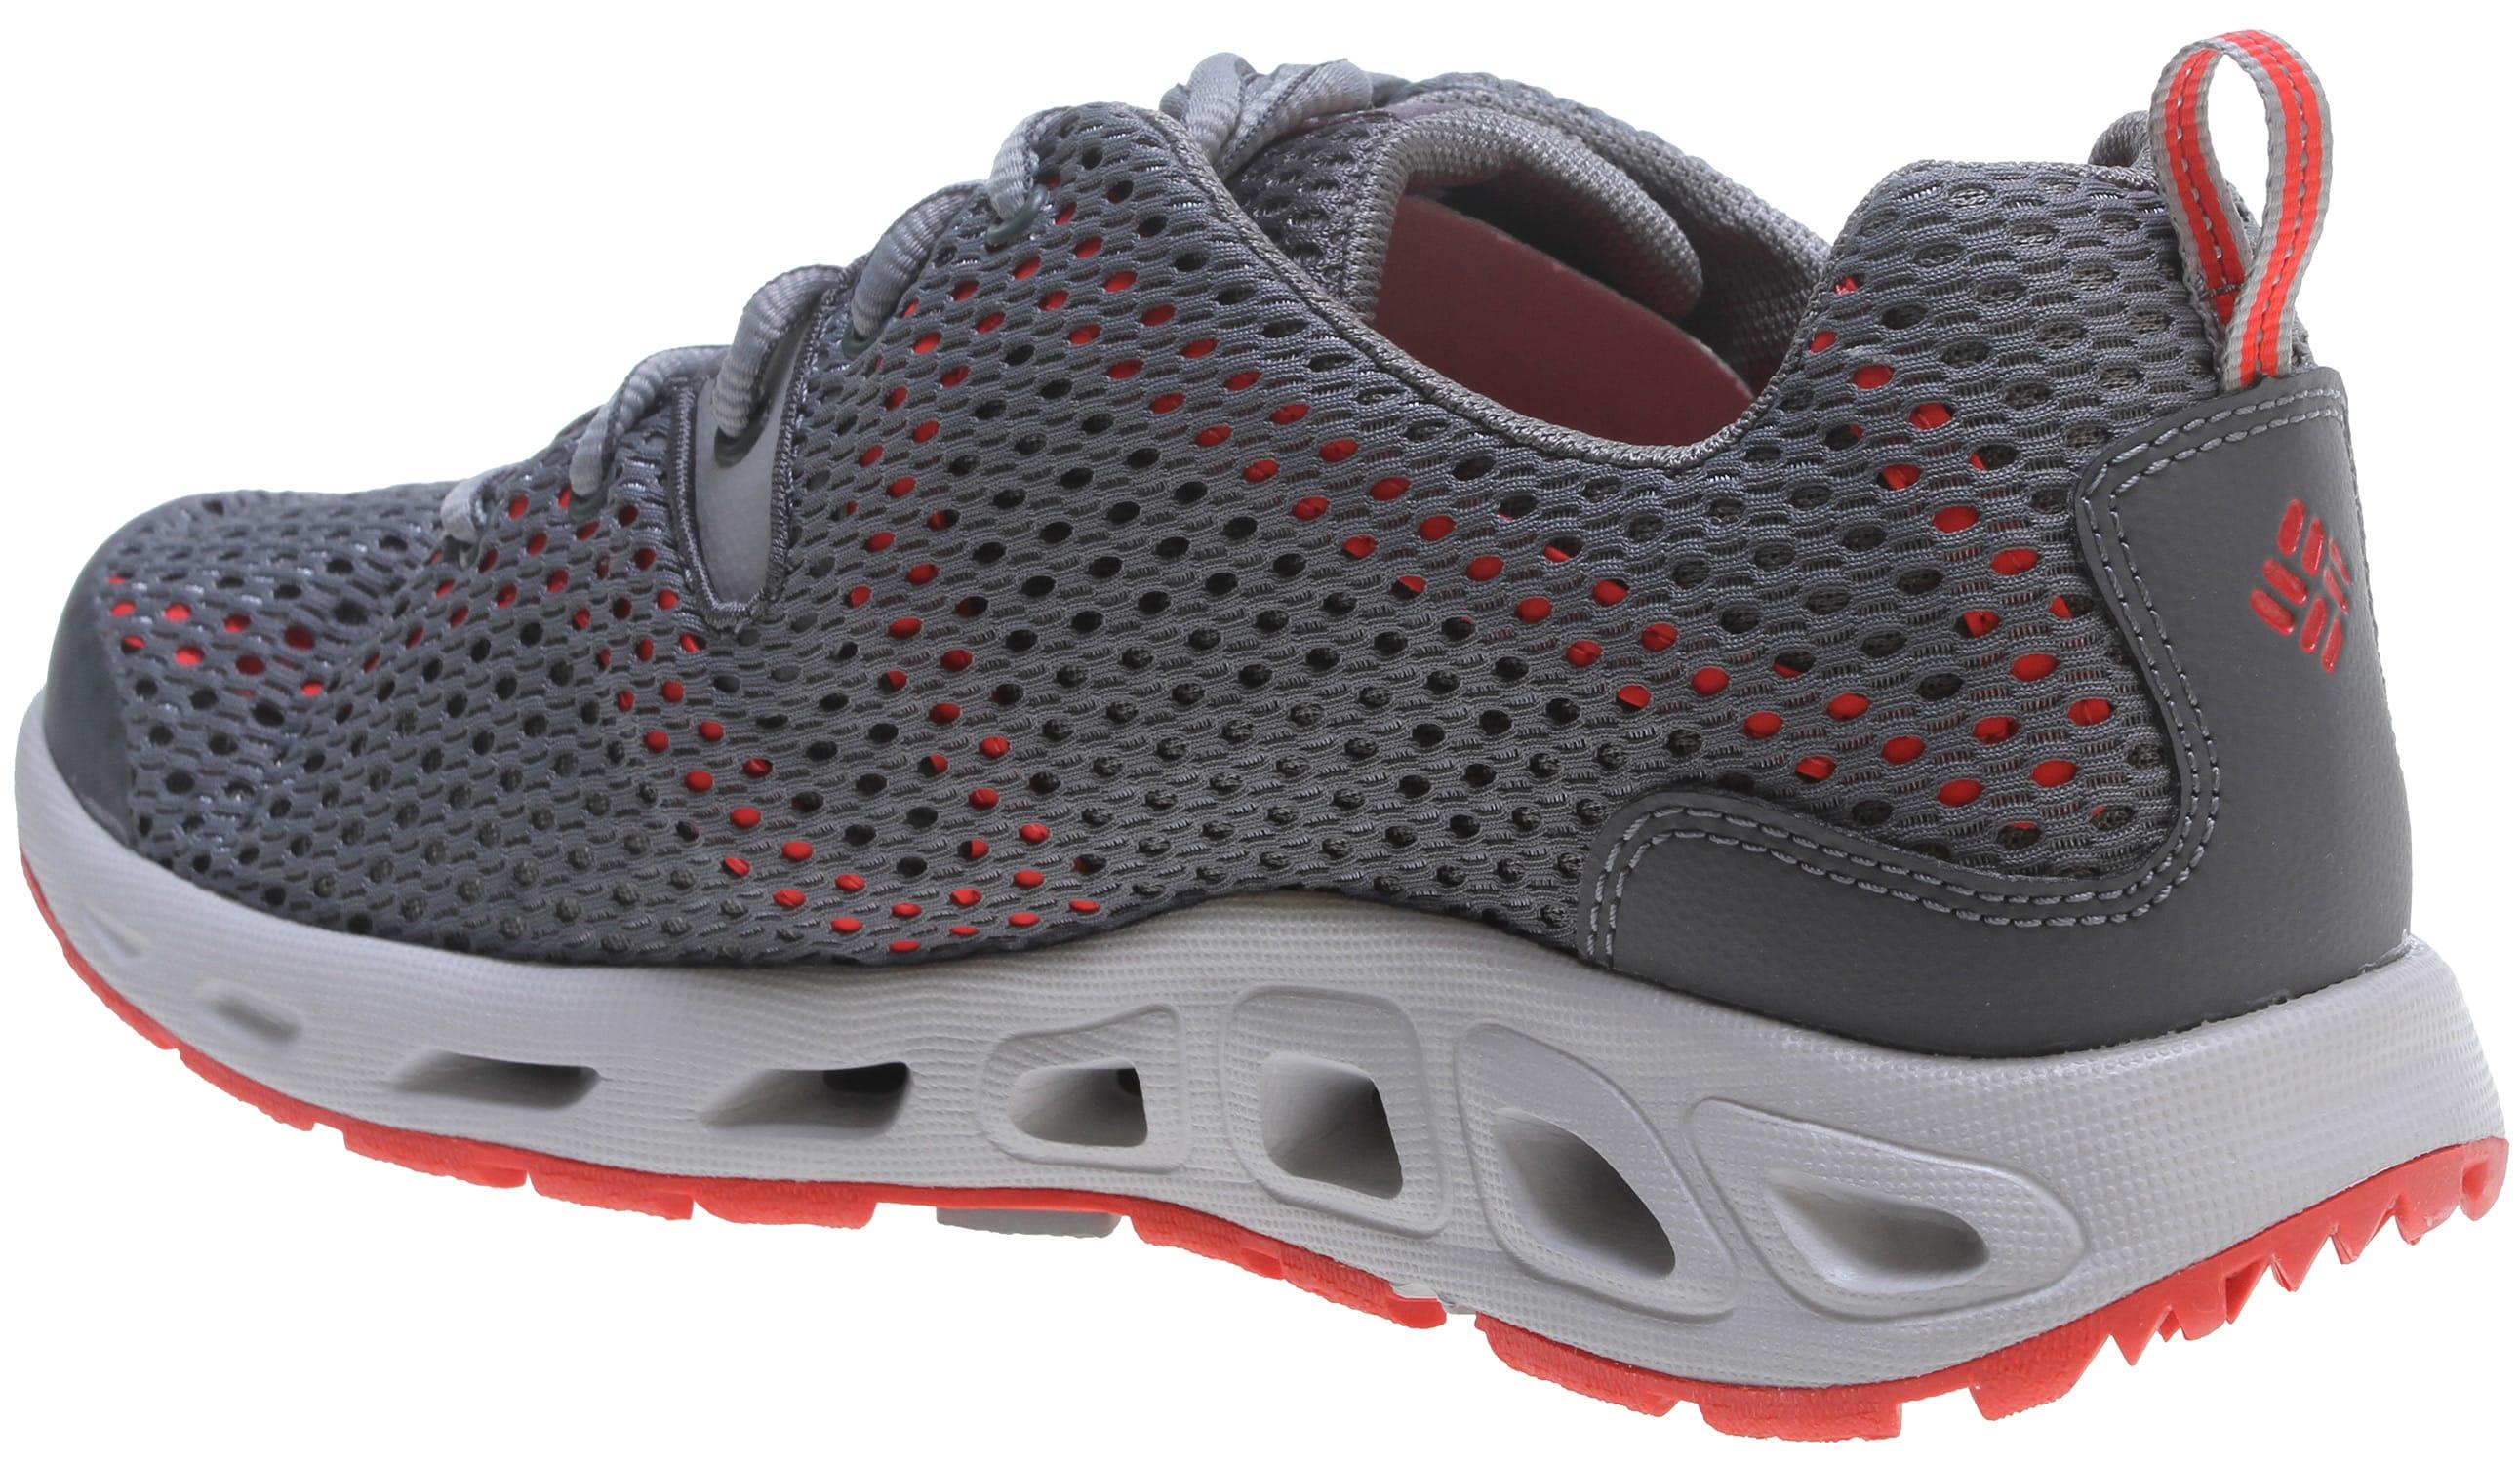 98f3c0e62ab Columbia Drainmaker II Water Shoes - thumbnail 3